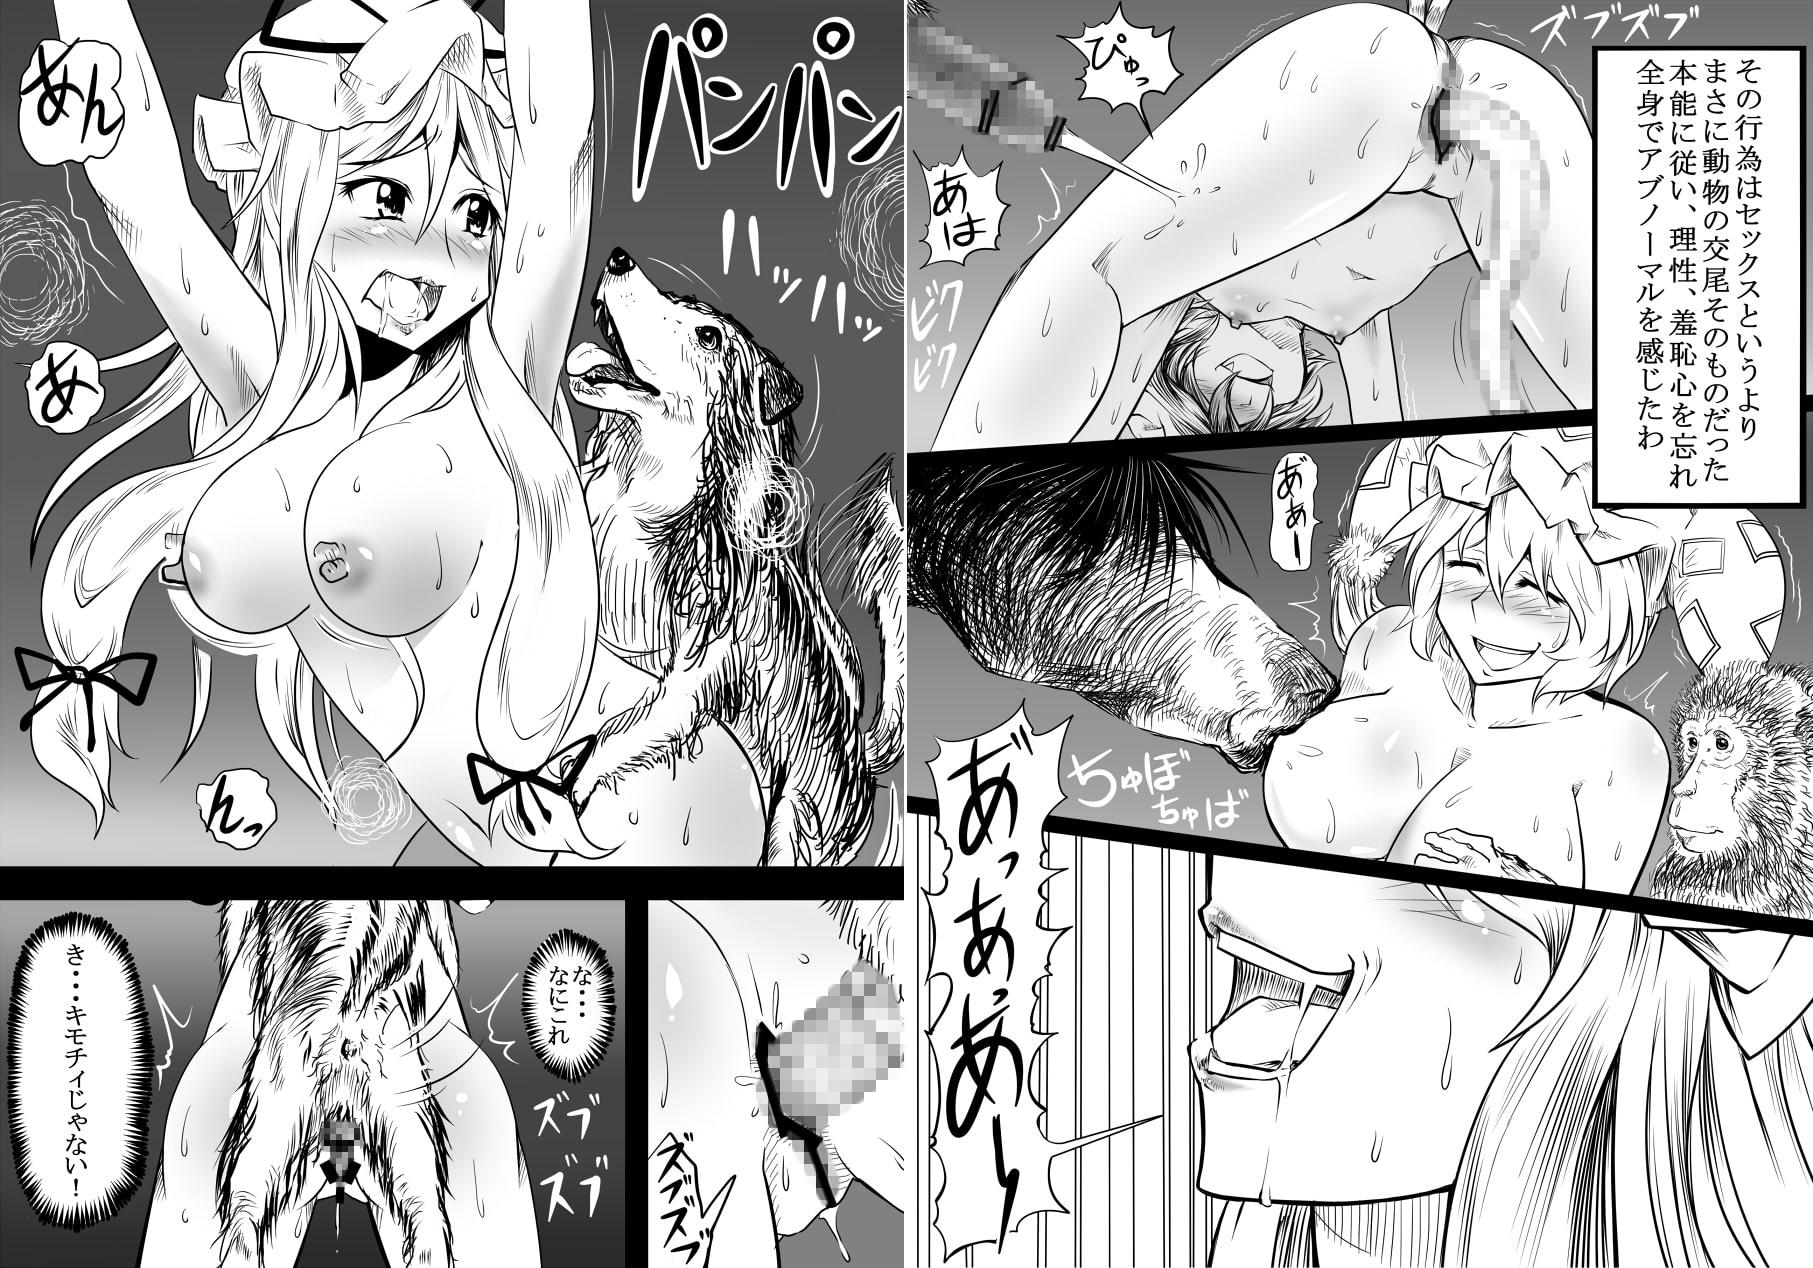 DLsite専売紫さんの汁まみれ獣姦シリーズ本 4点セット♪(おまけ付)